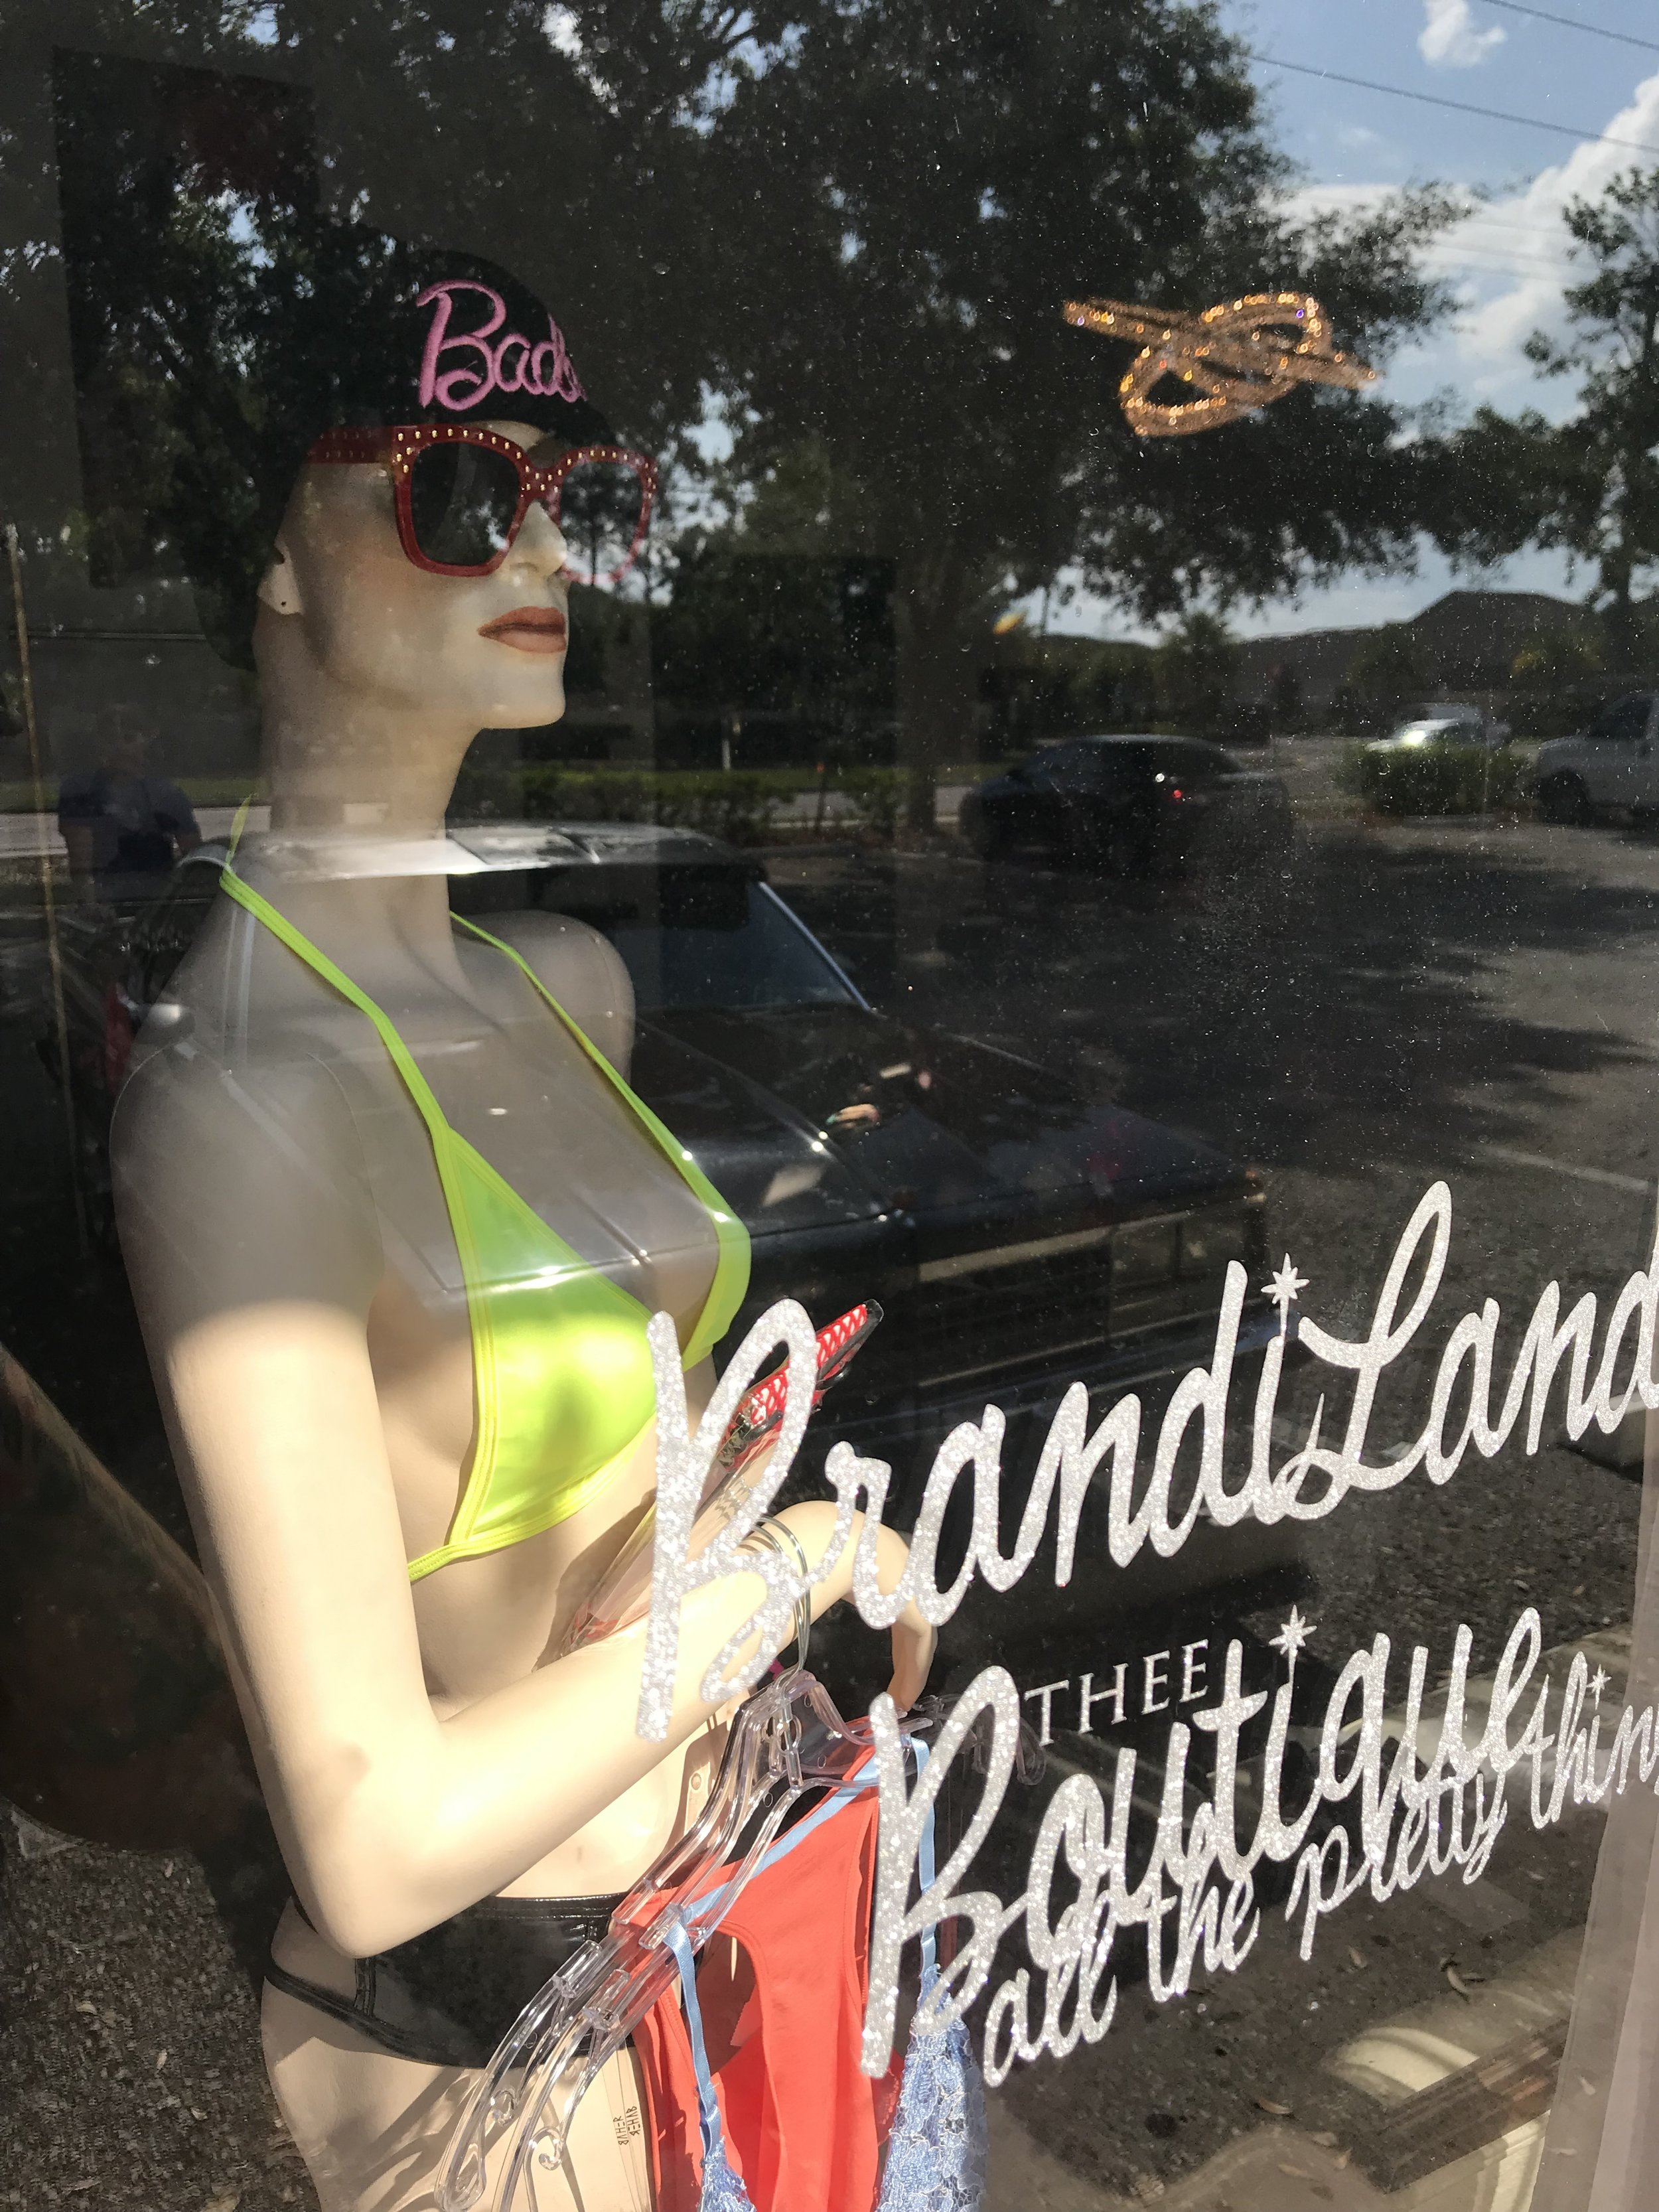 One of the BrandiLand mannequins, Joyce.